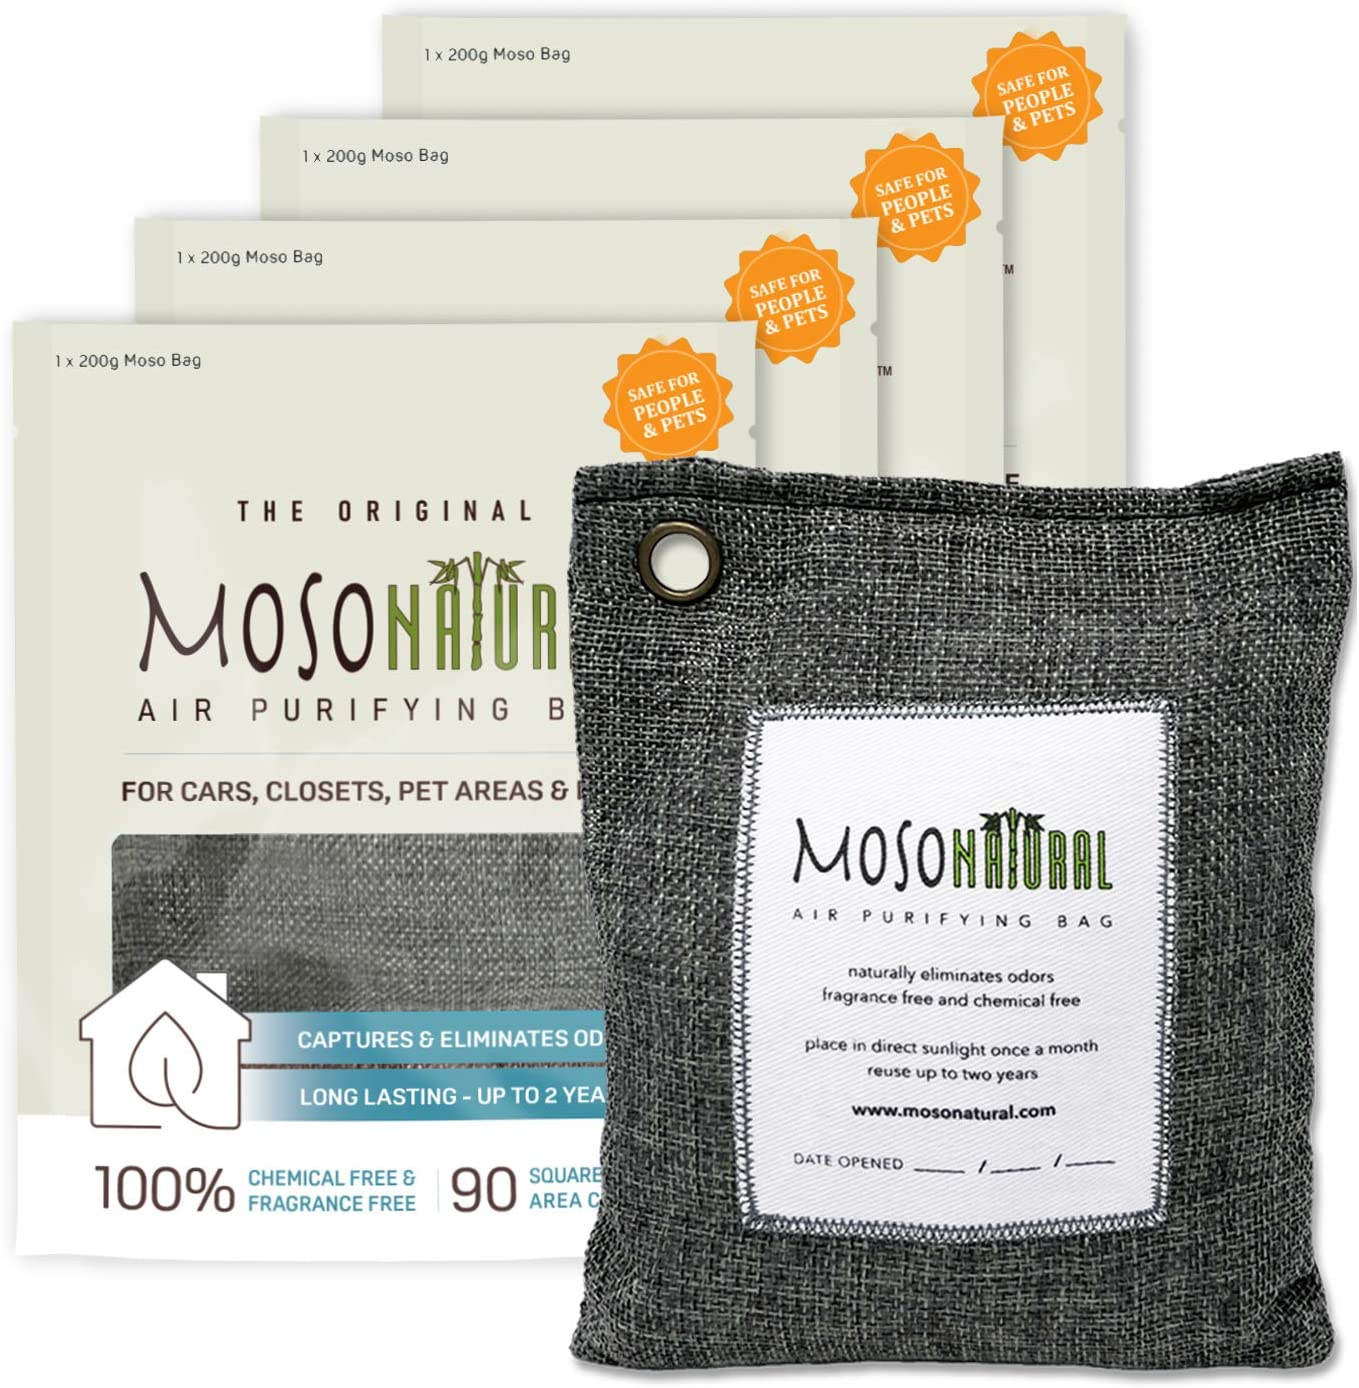 Moso Natural Air Purifying Bag from Amazon